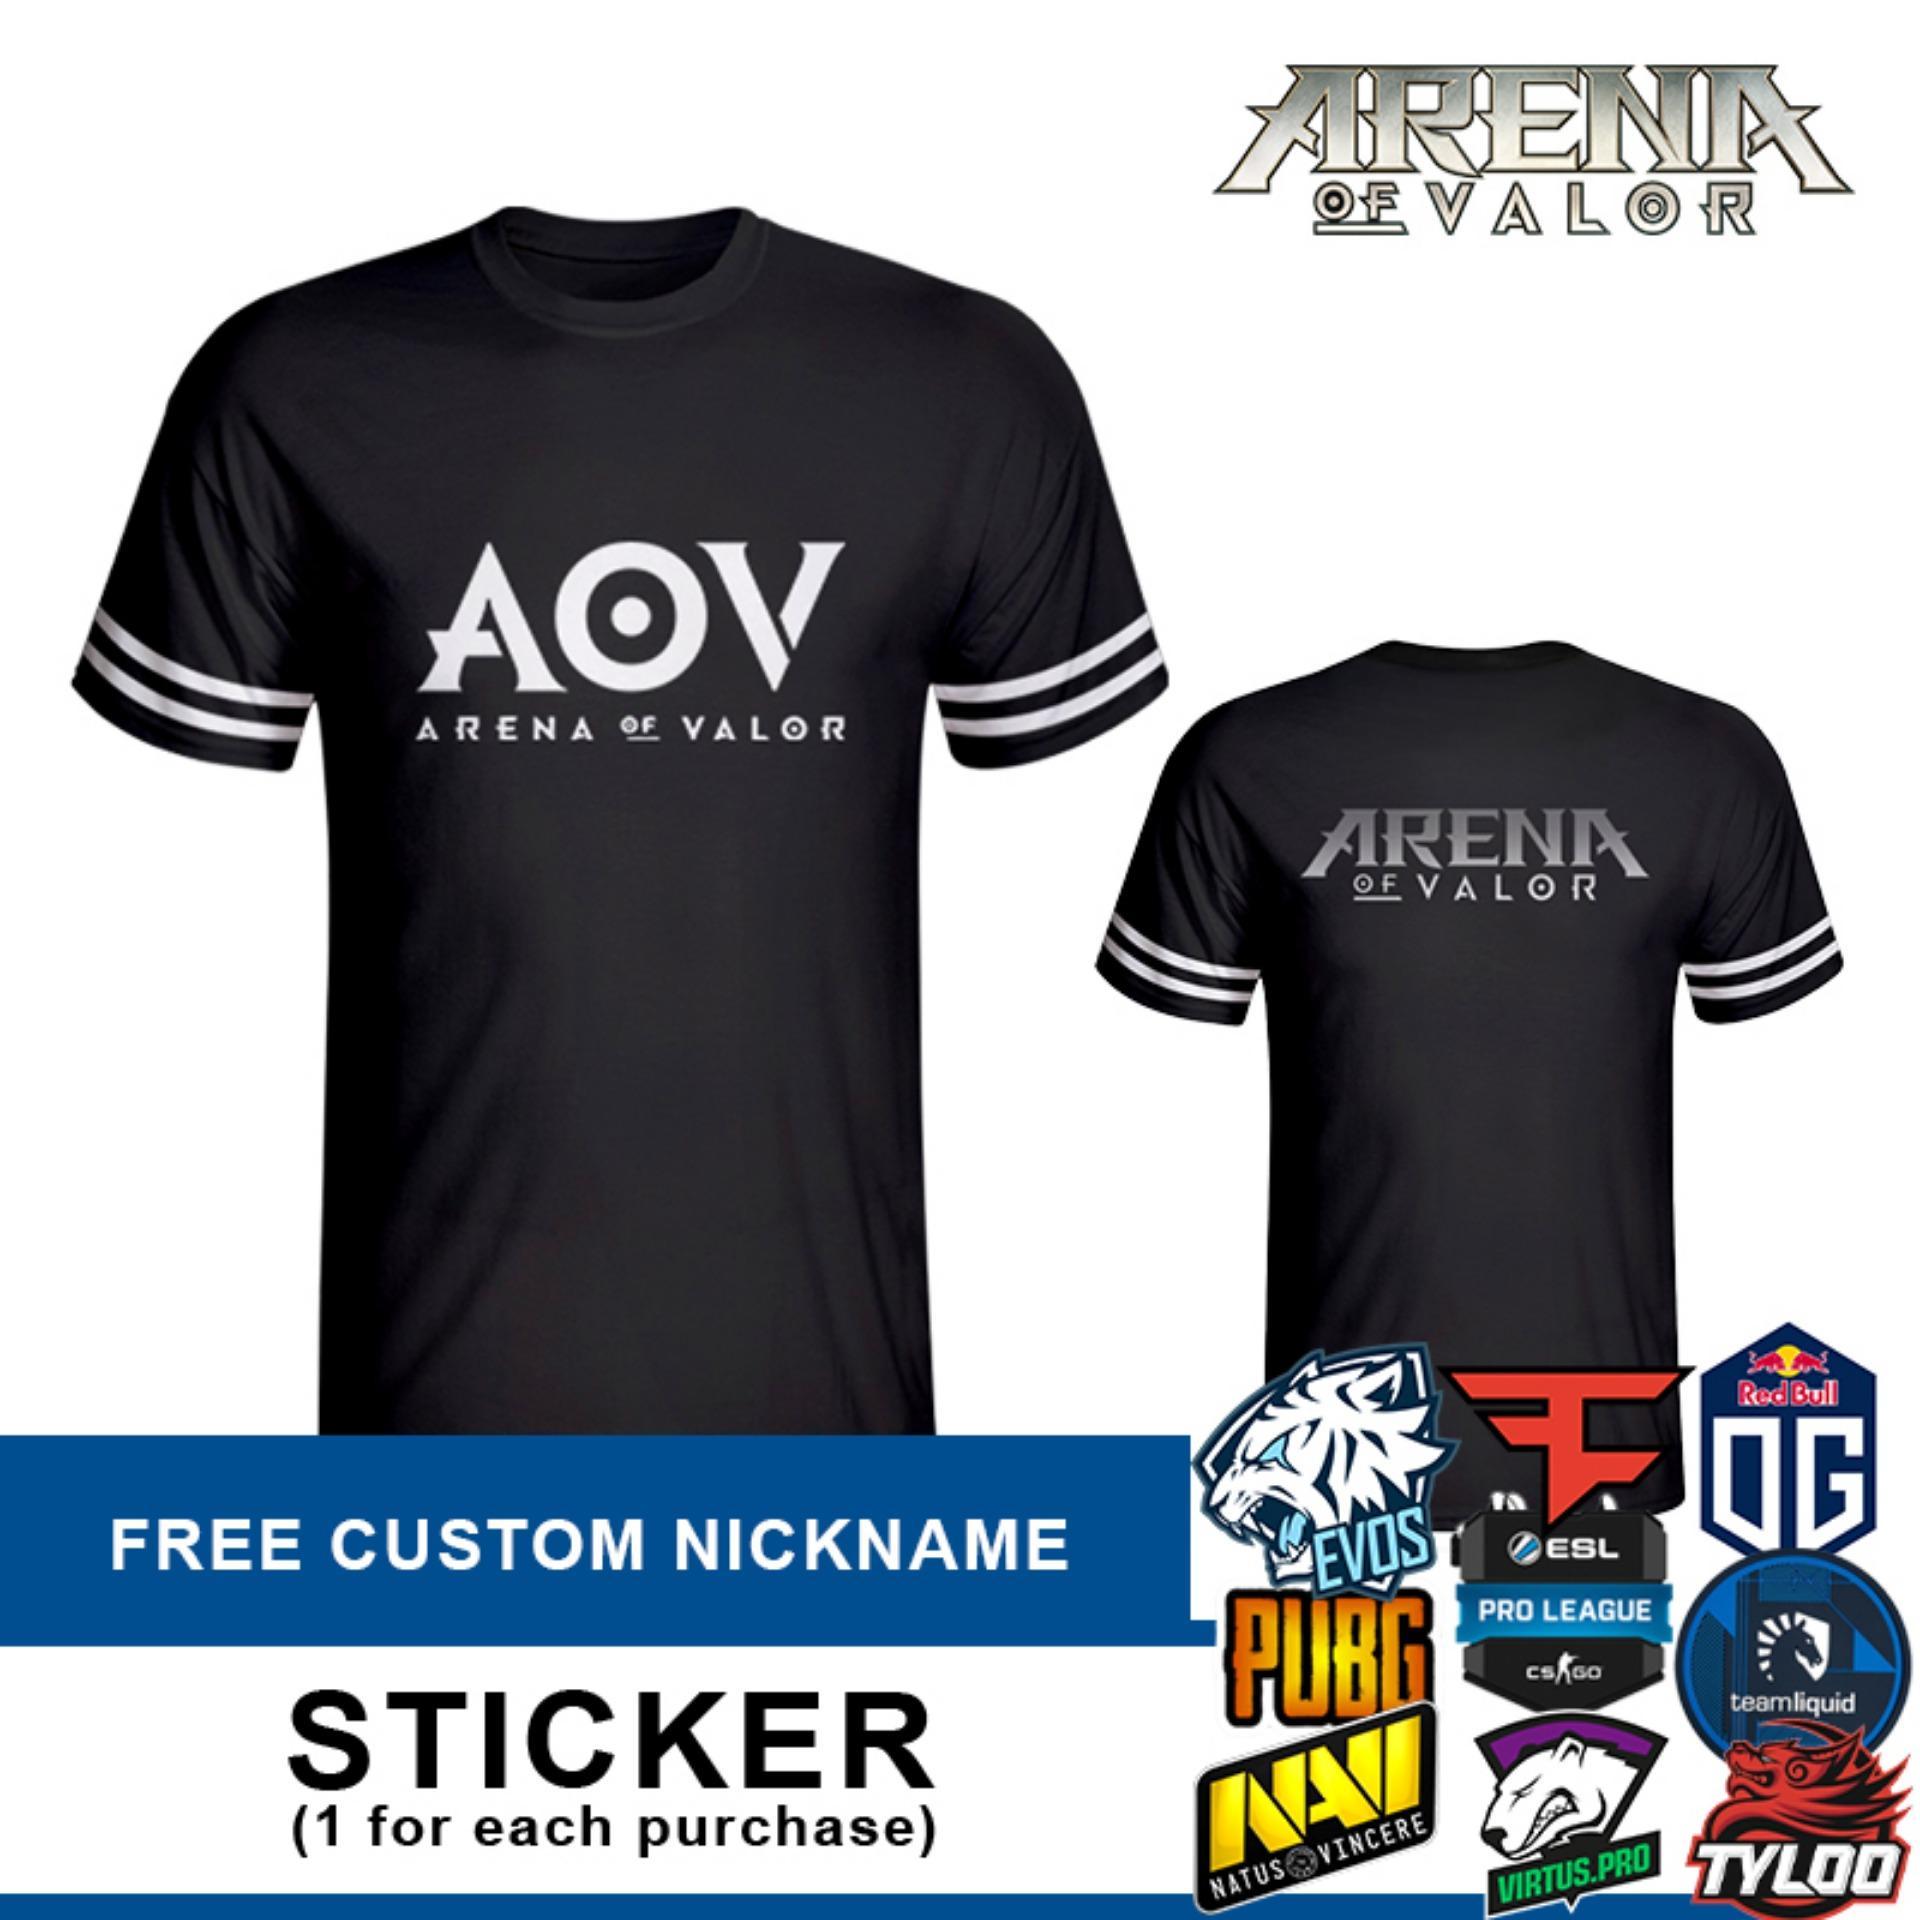 Tshirt Arena Of Valor Black (AOV) + Custom NICKNAME